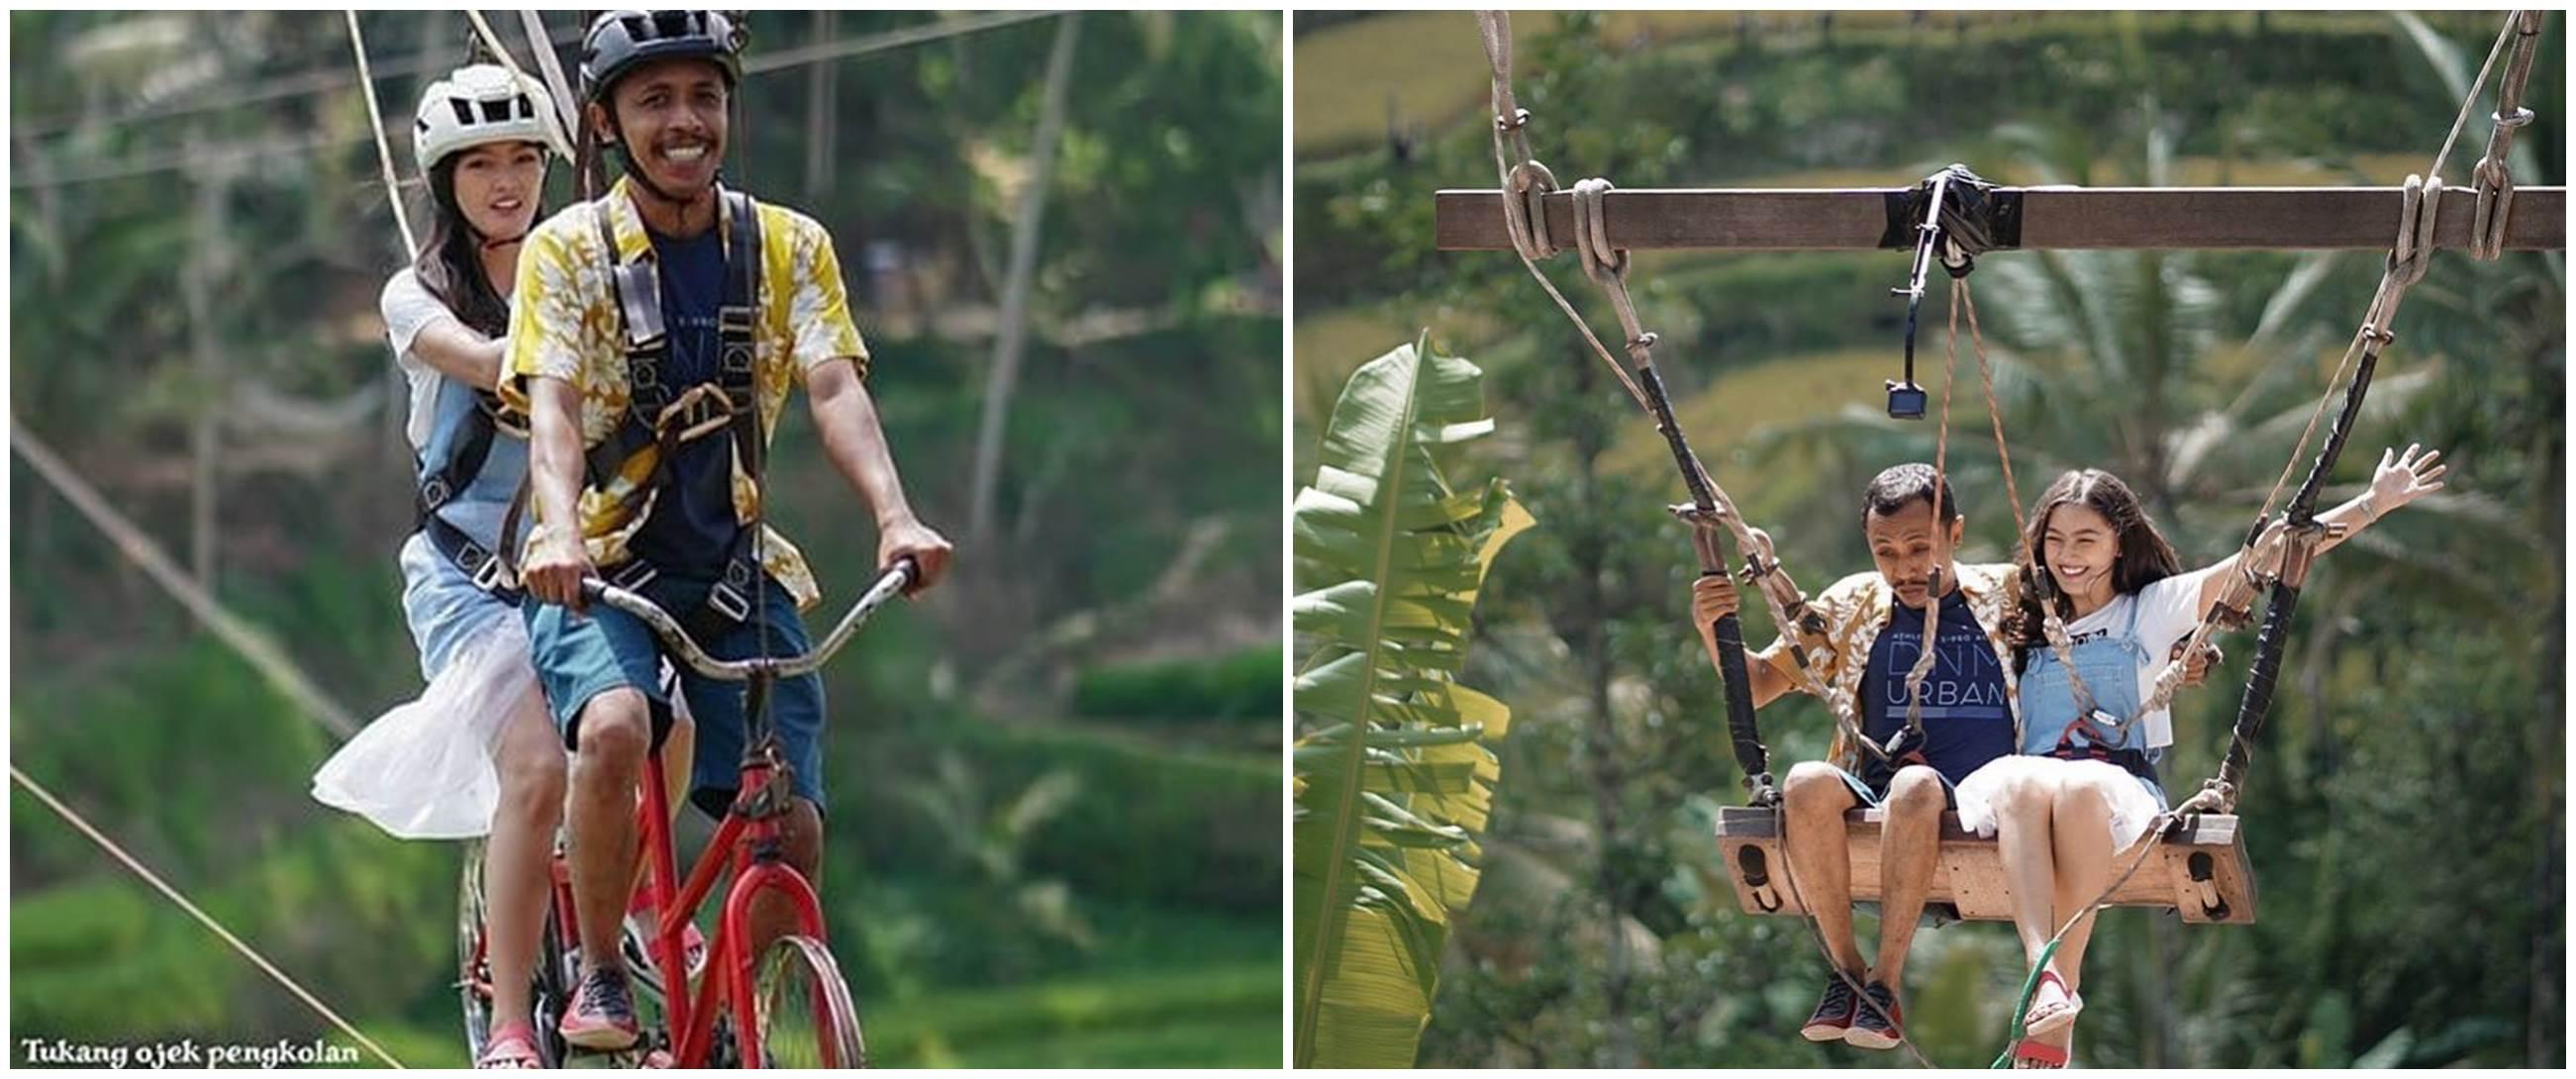 8 Potret bulan madu Mas Pur dan Rinjani TOP di Bali, so sweet